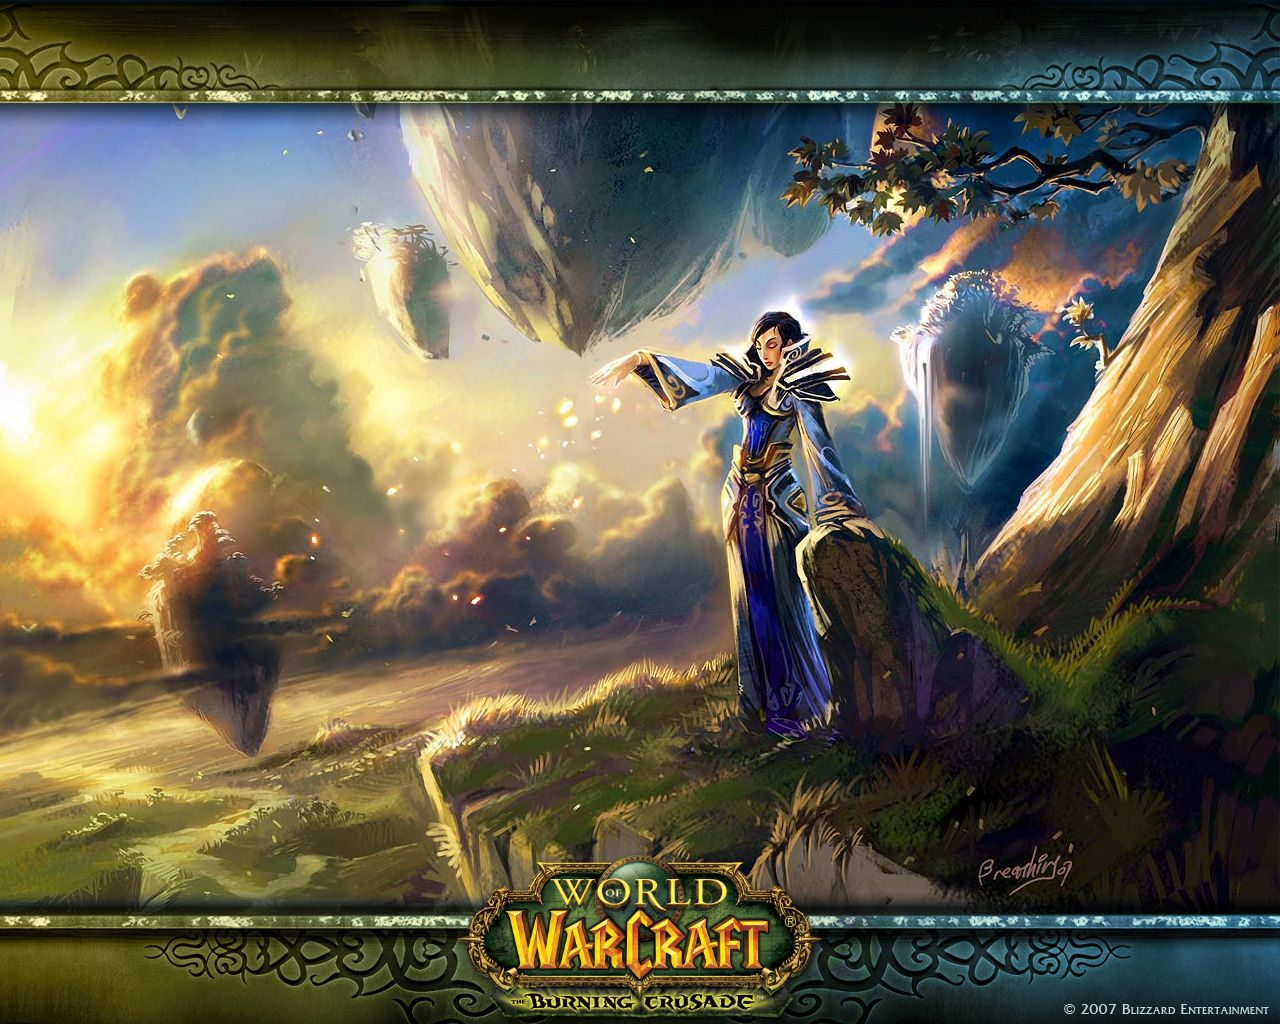 World of Warcraft. Nagrand, so beautiful